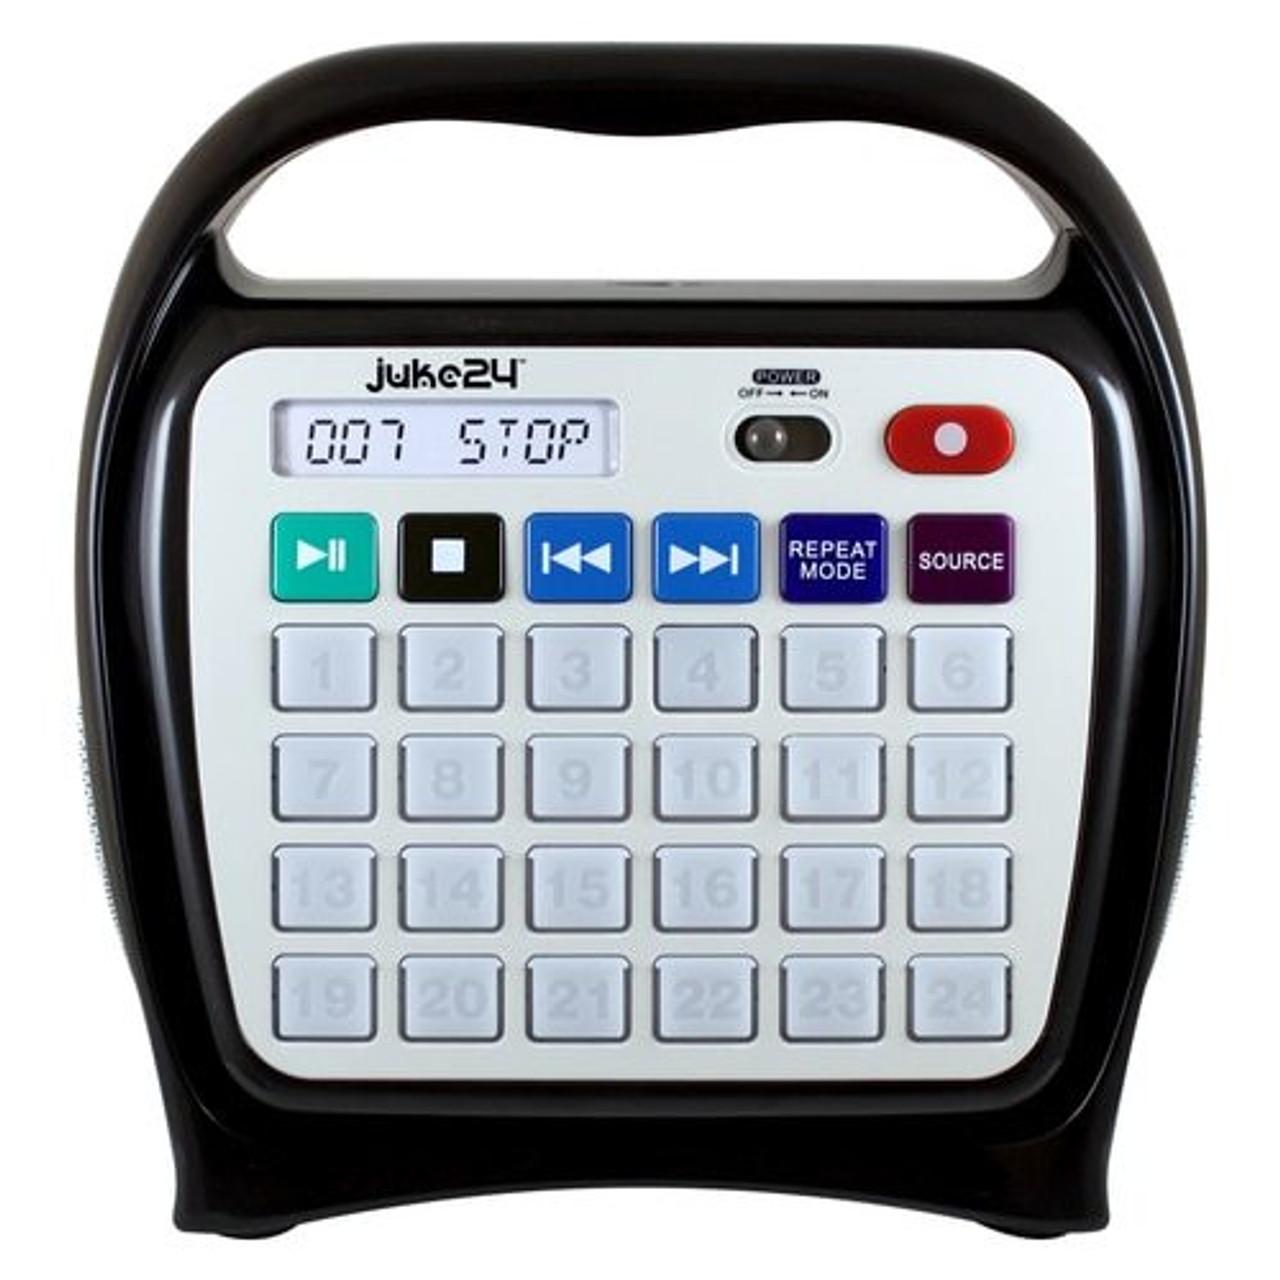 HamiltonBuhl Juke24 - Portable, Digital Jukebox with CD Player and Karaoke  Function - Black/Gray